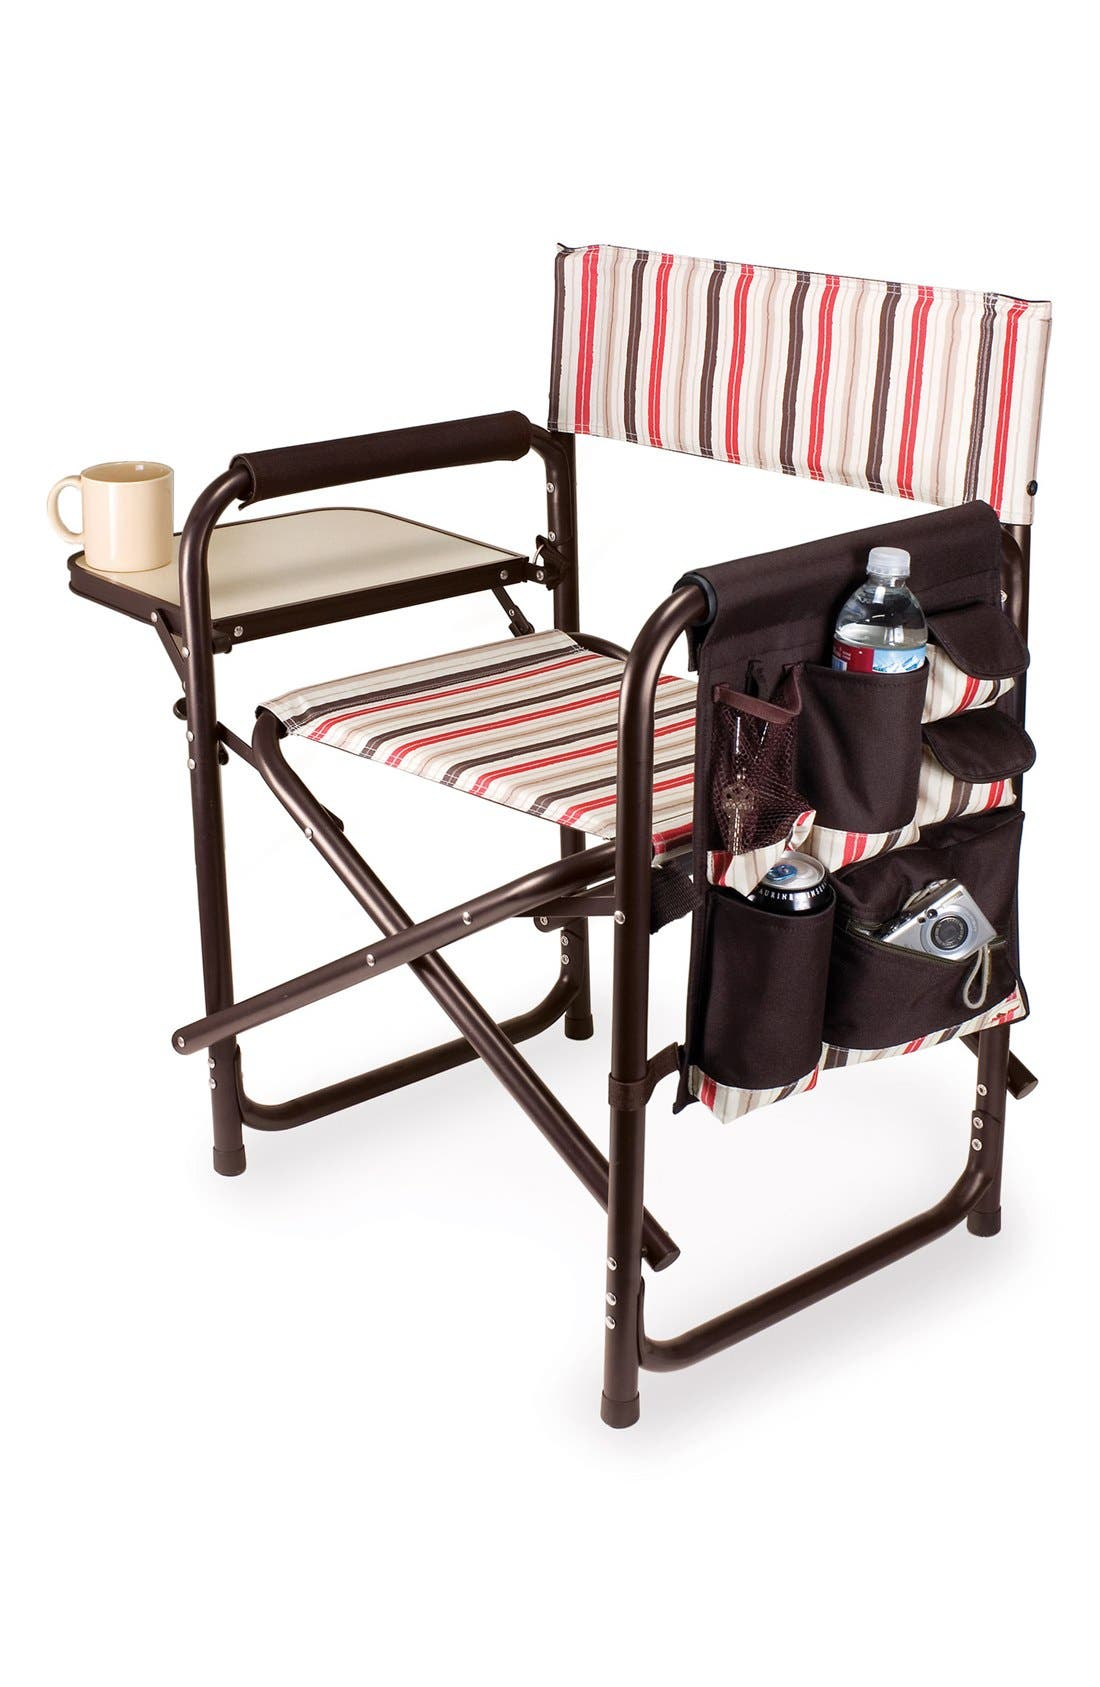 'Sports' Folding Chair,                             Main thumbnail 1, color,                             Brown